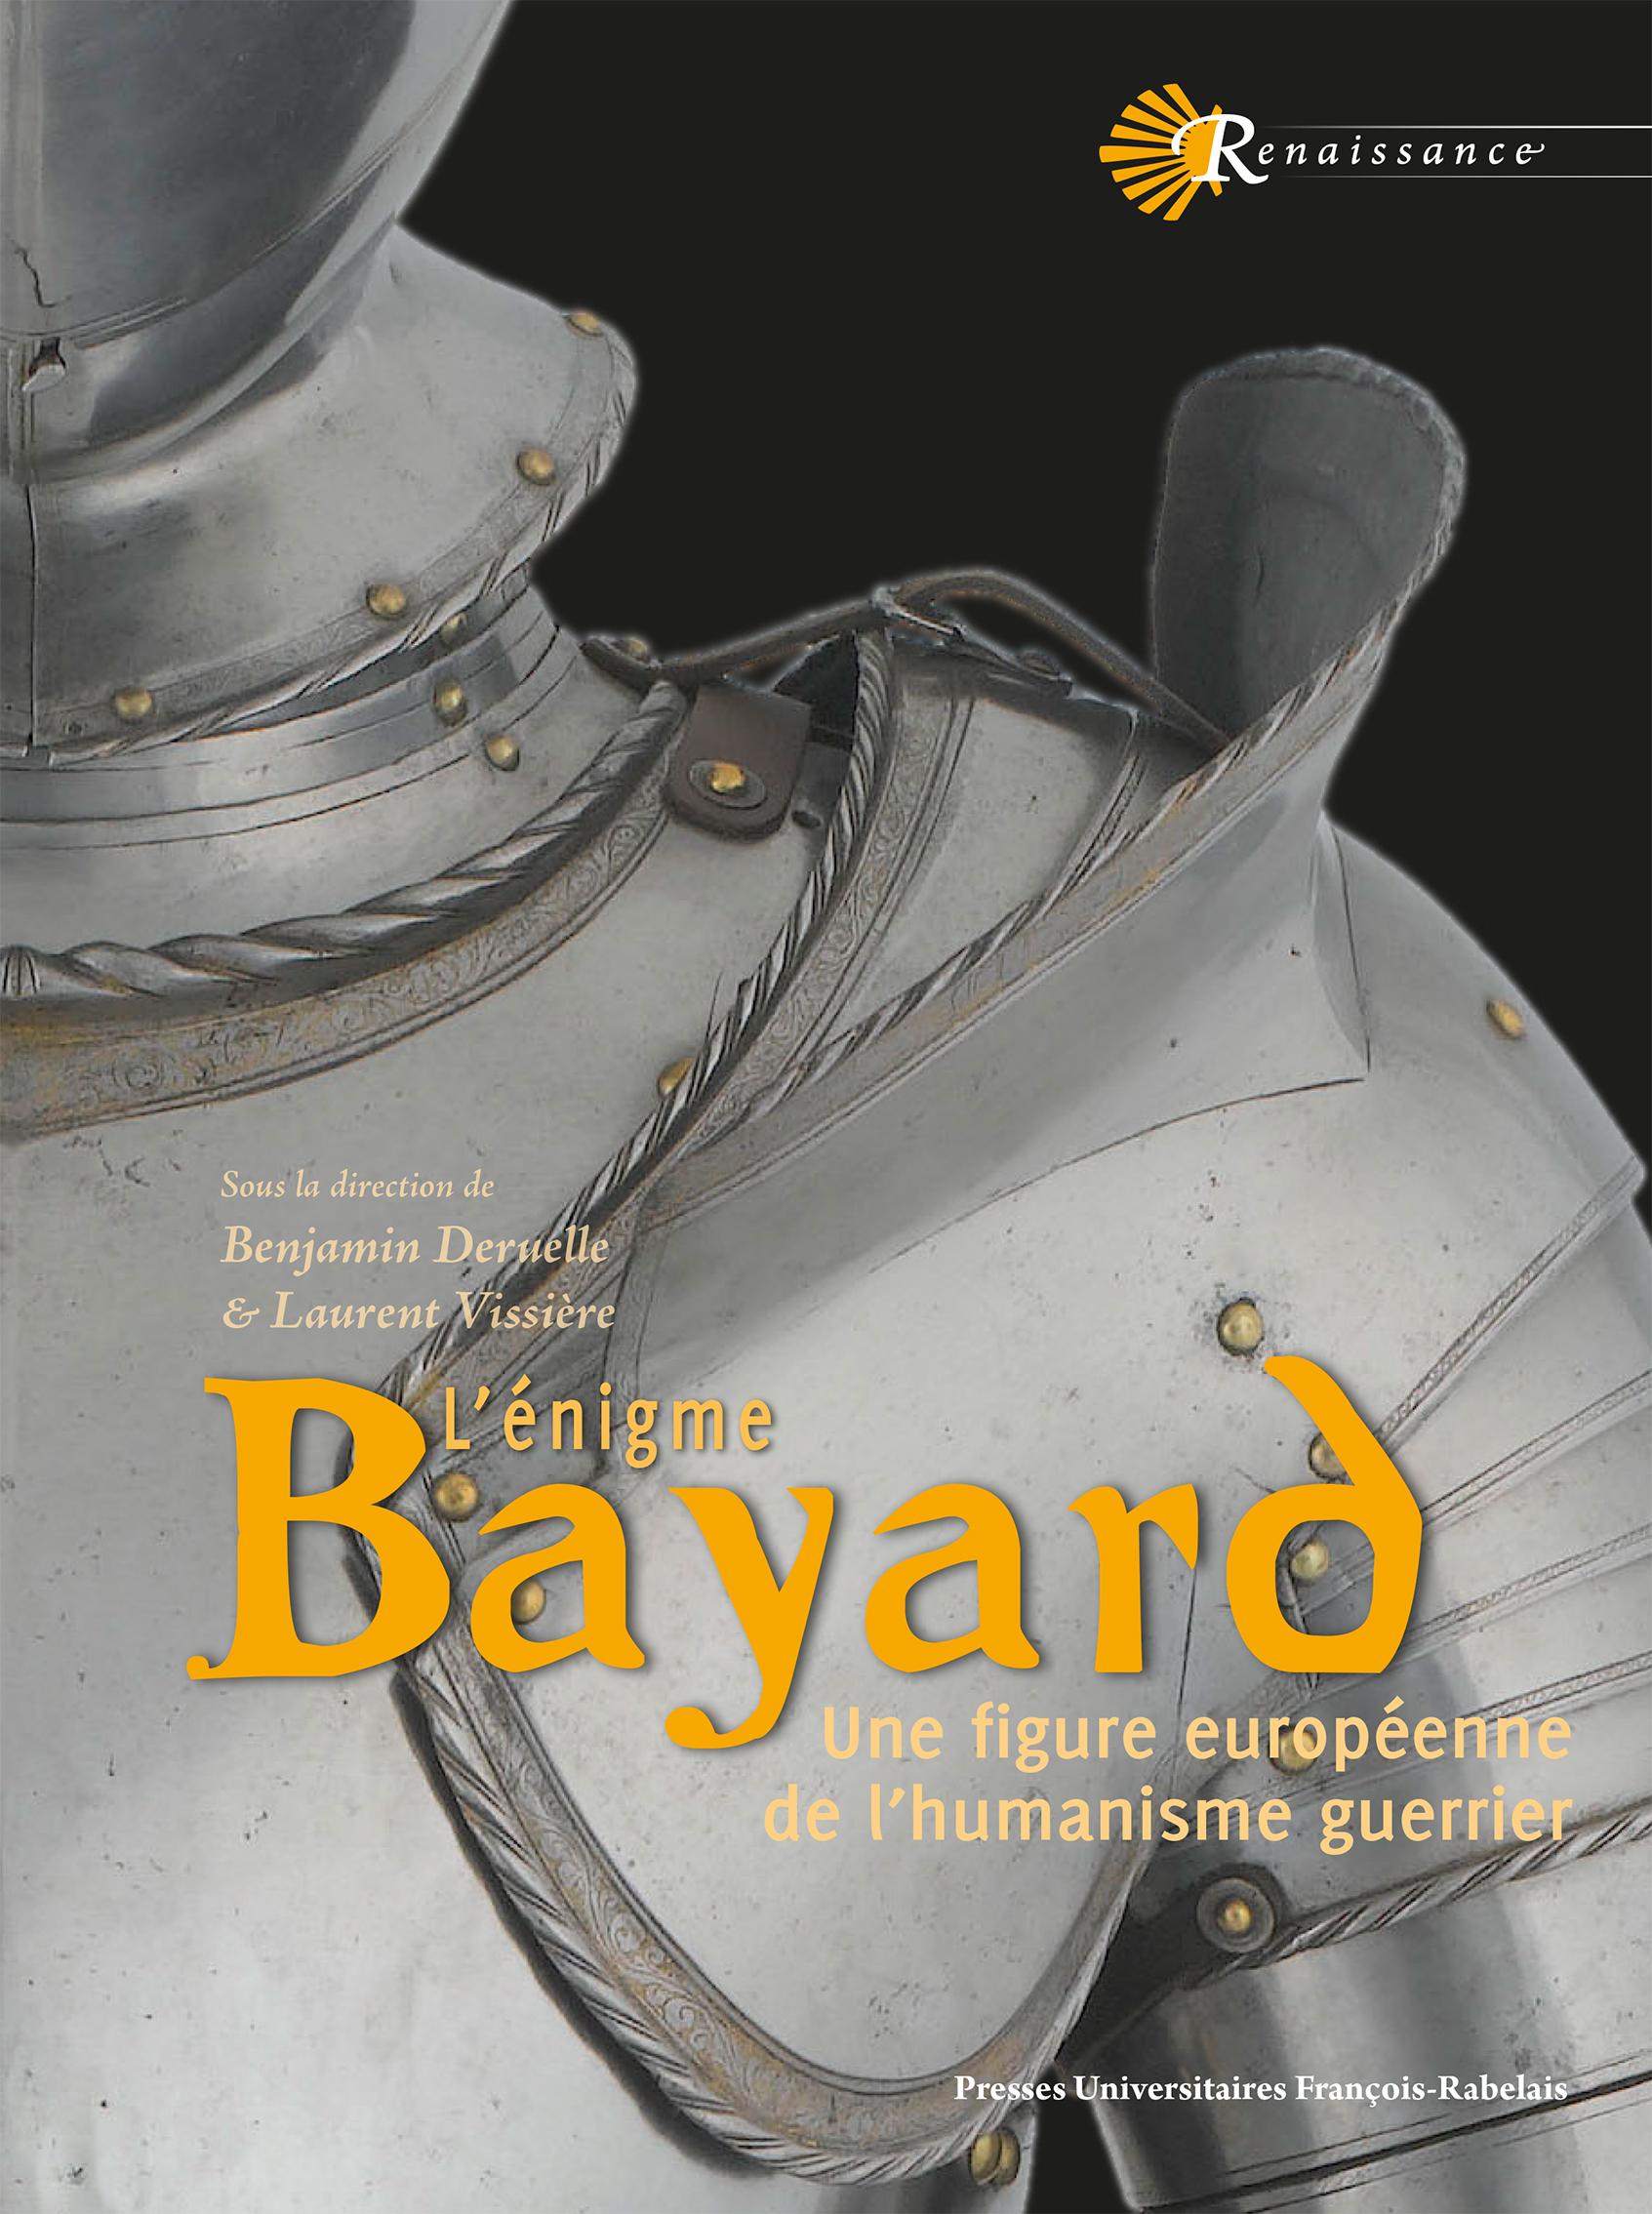 L'énigme Bayard